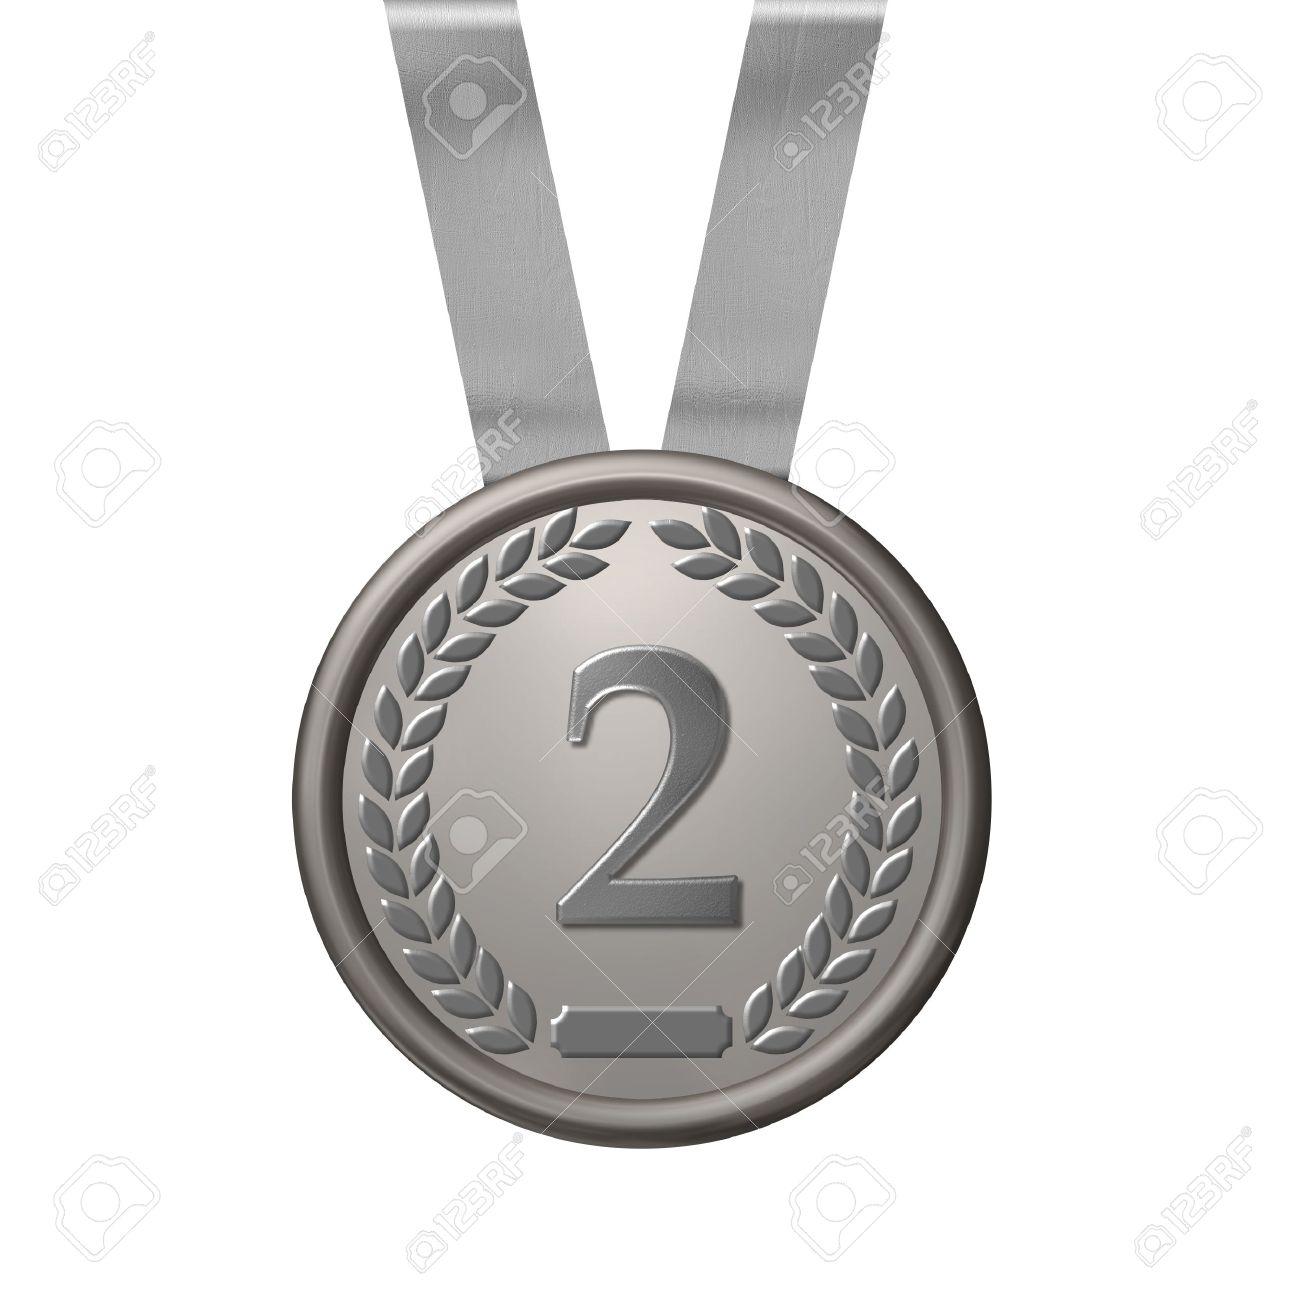 [Imagen: 6700985-ilustraci%C3%B3n-de-una-medalla-de-plata-.jpg]